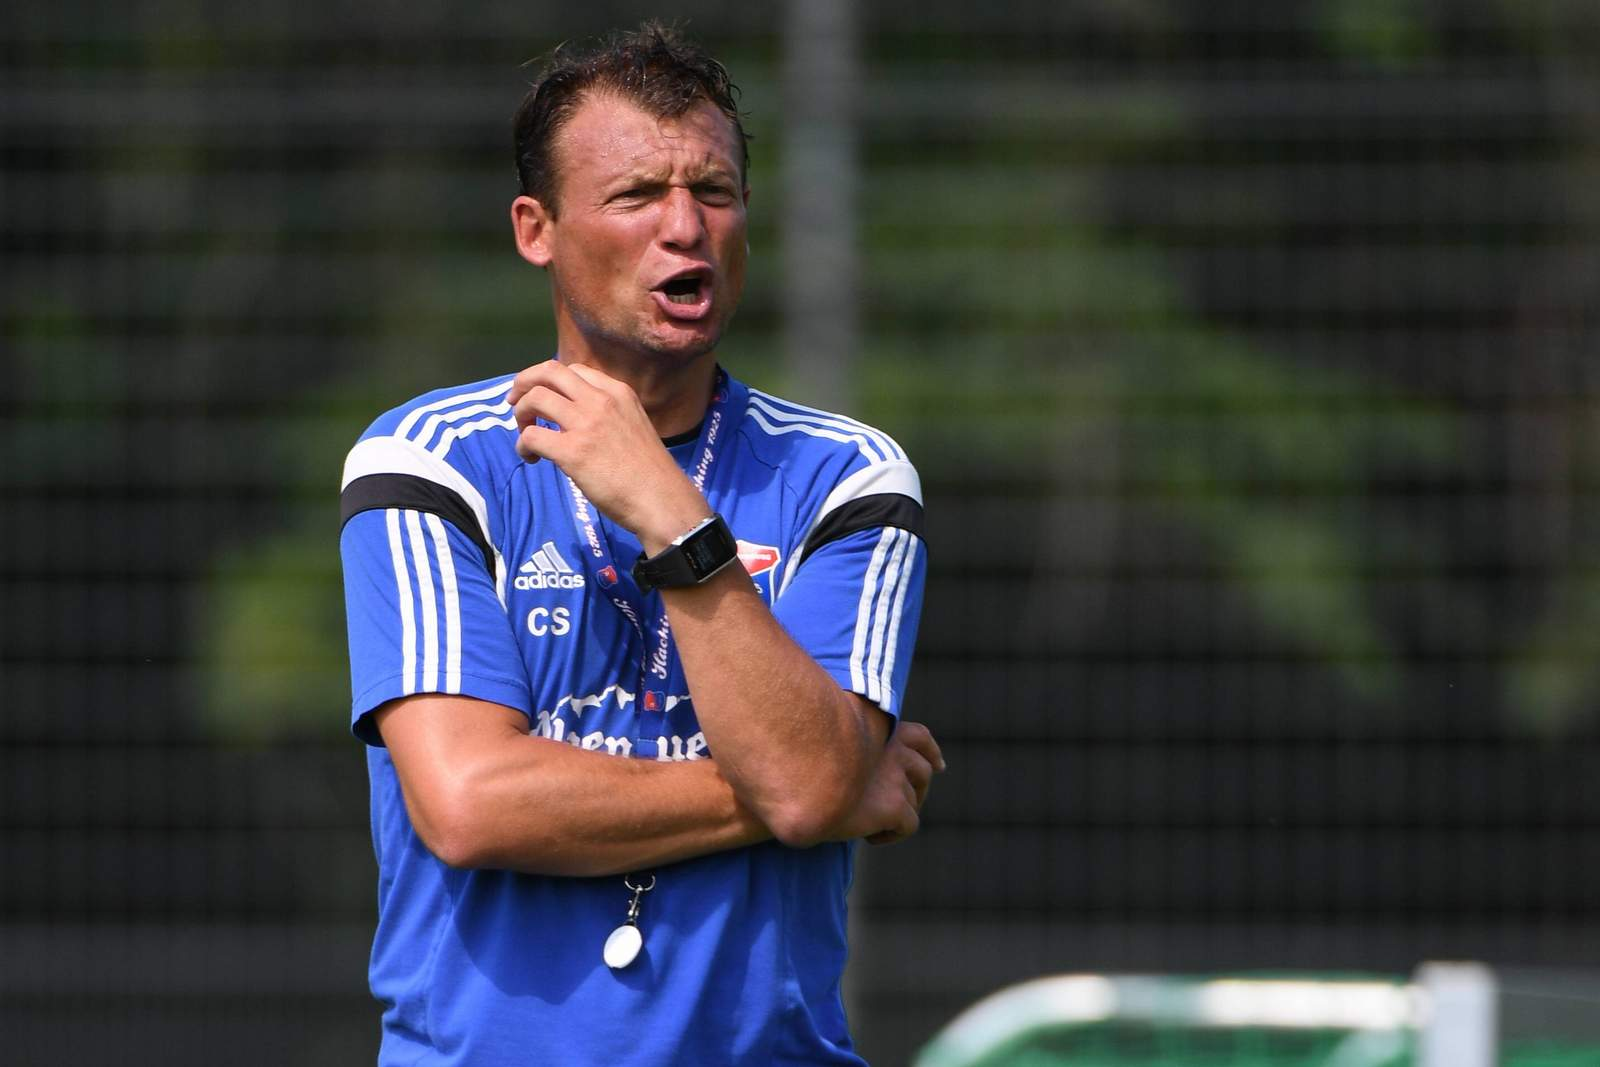 Kritik am Defensivverhalten: Hachings Coach Claus Schromm